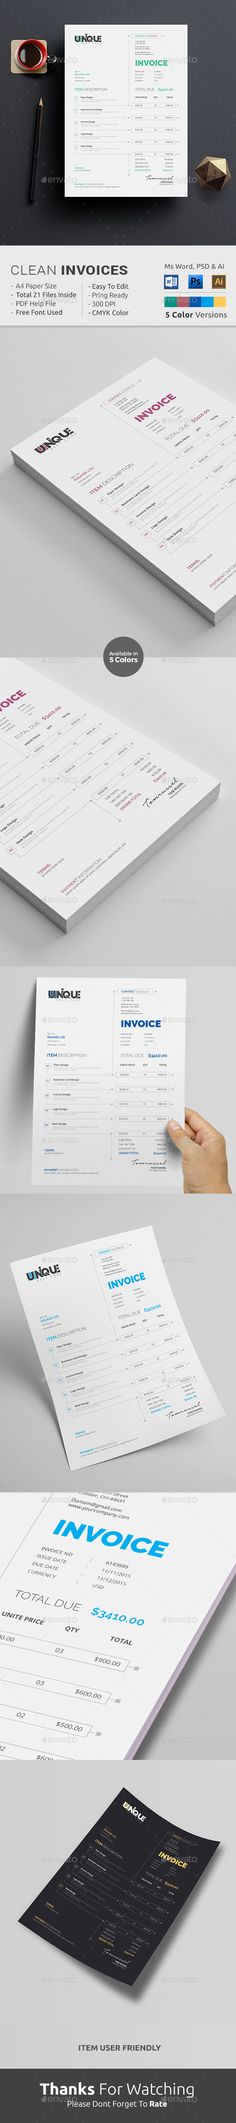 #Clean #Unique Invoice Design..Download here: http://graphicriver.net/item/clean-invoice/13859469?ref=arroganttype